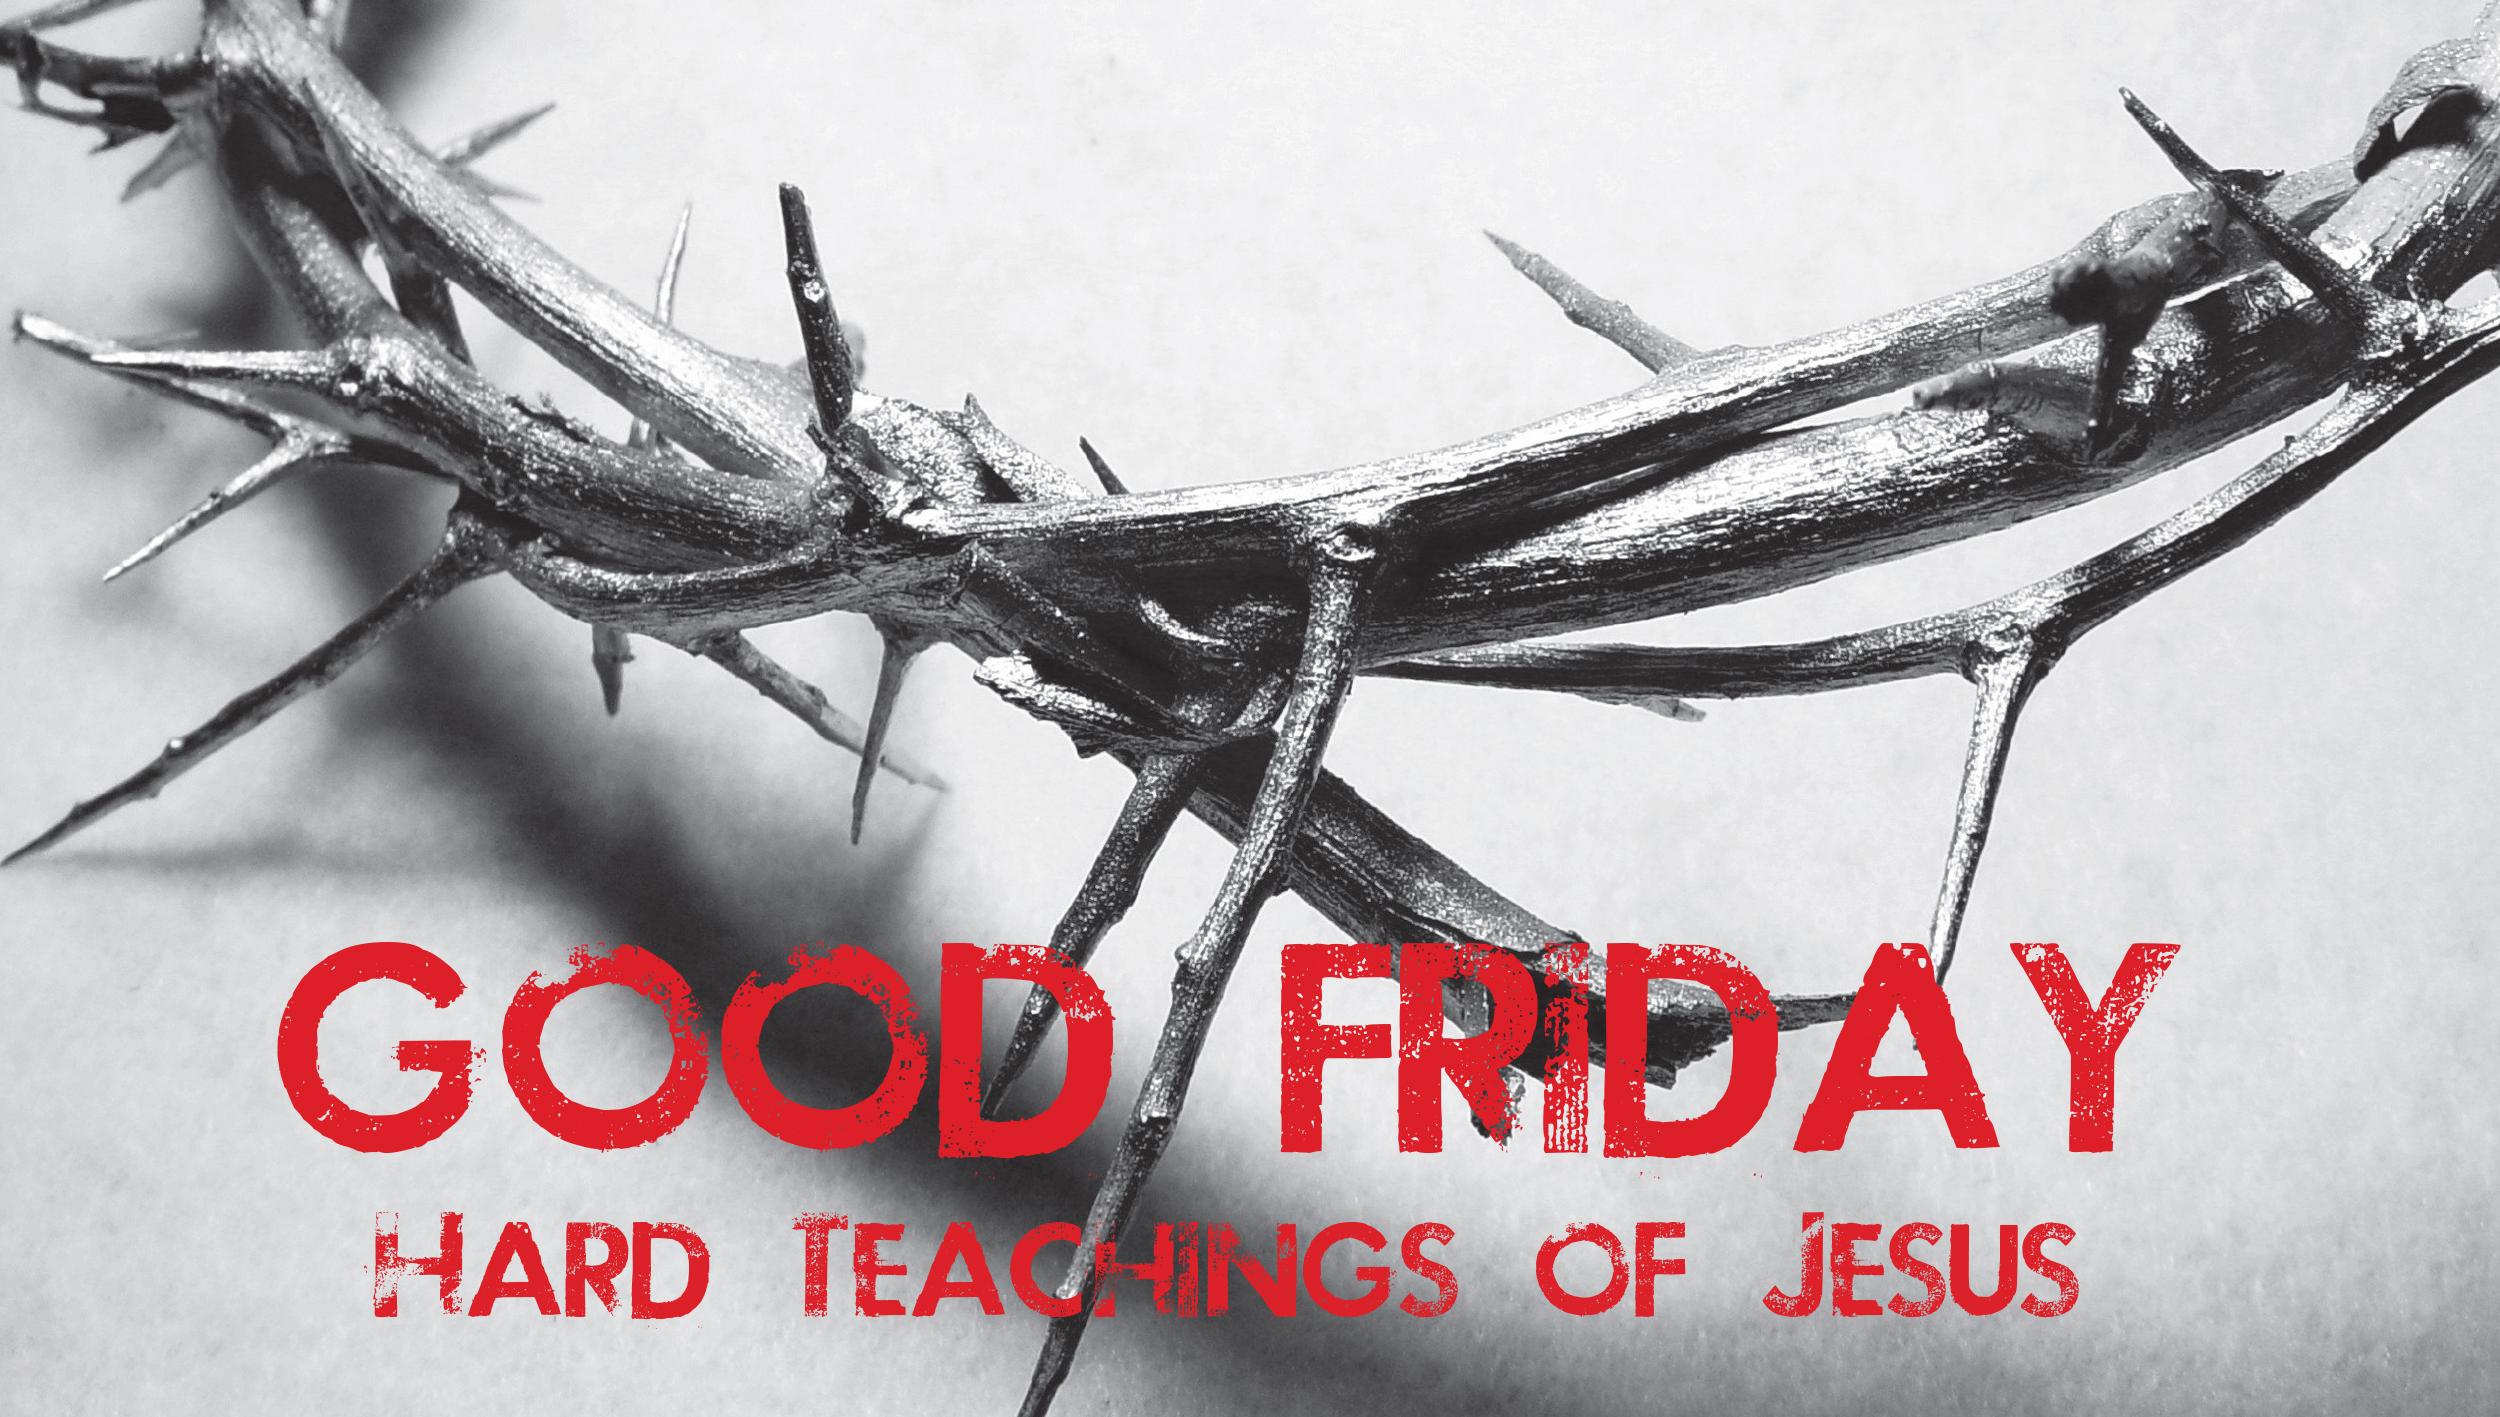 Good Friday Thorn Of Jesus Image